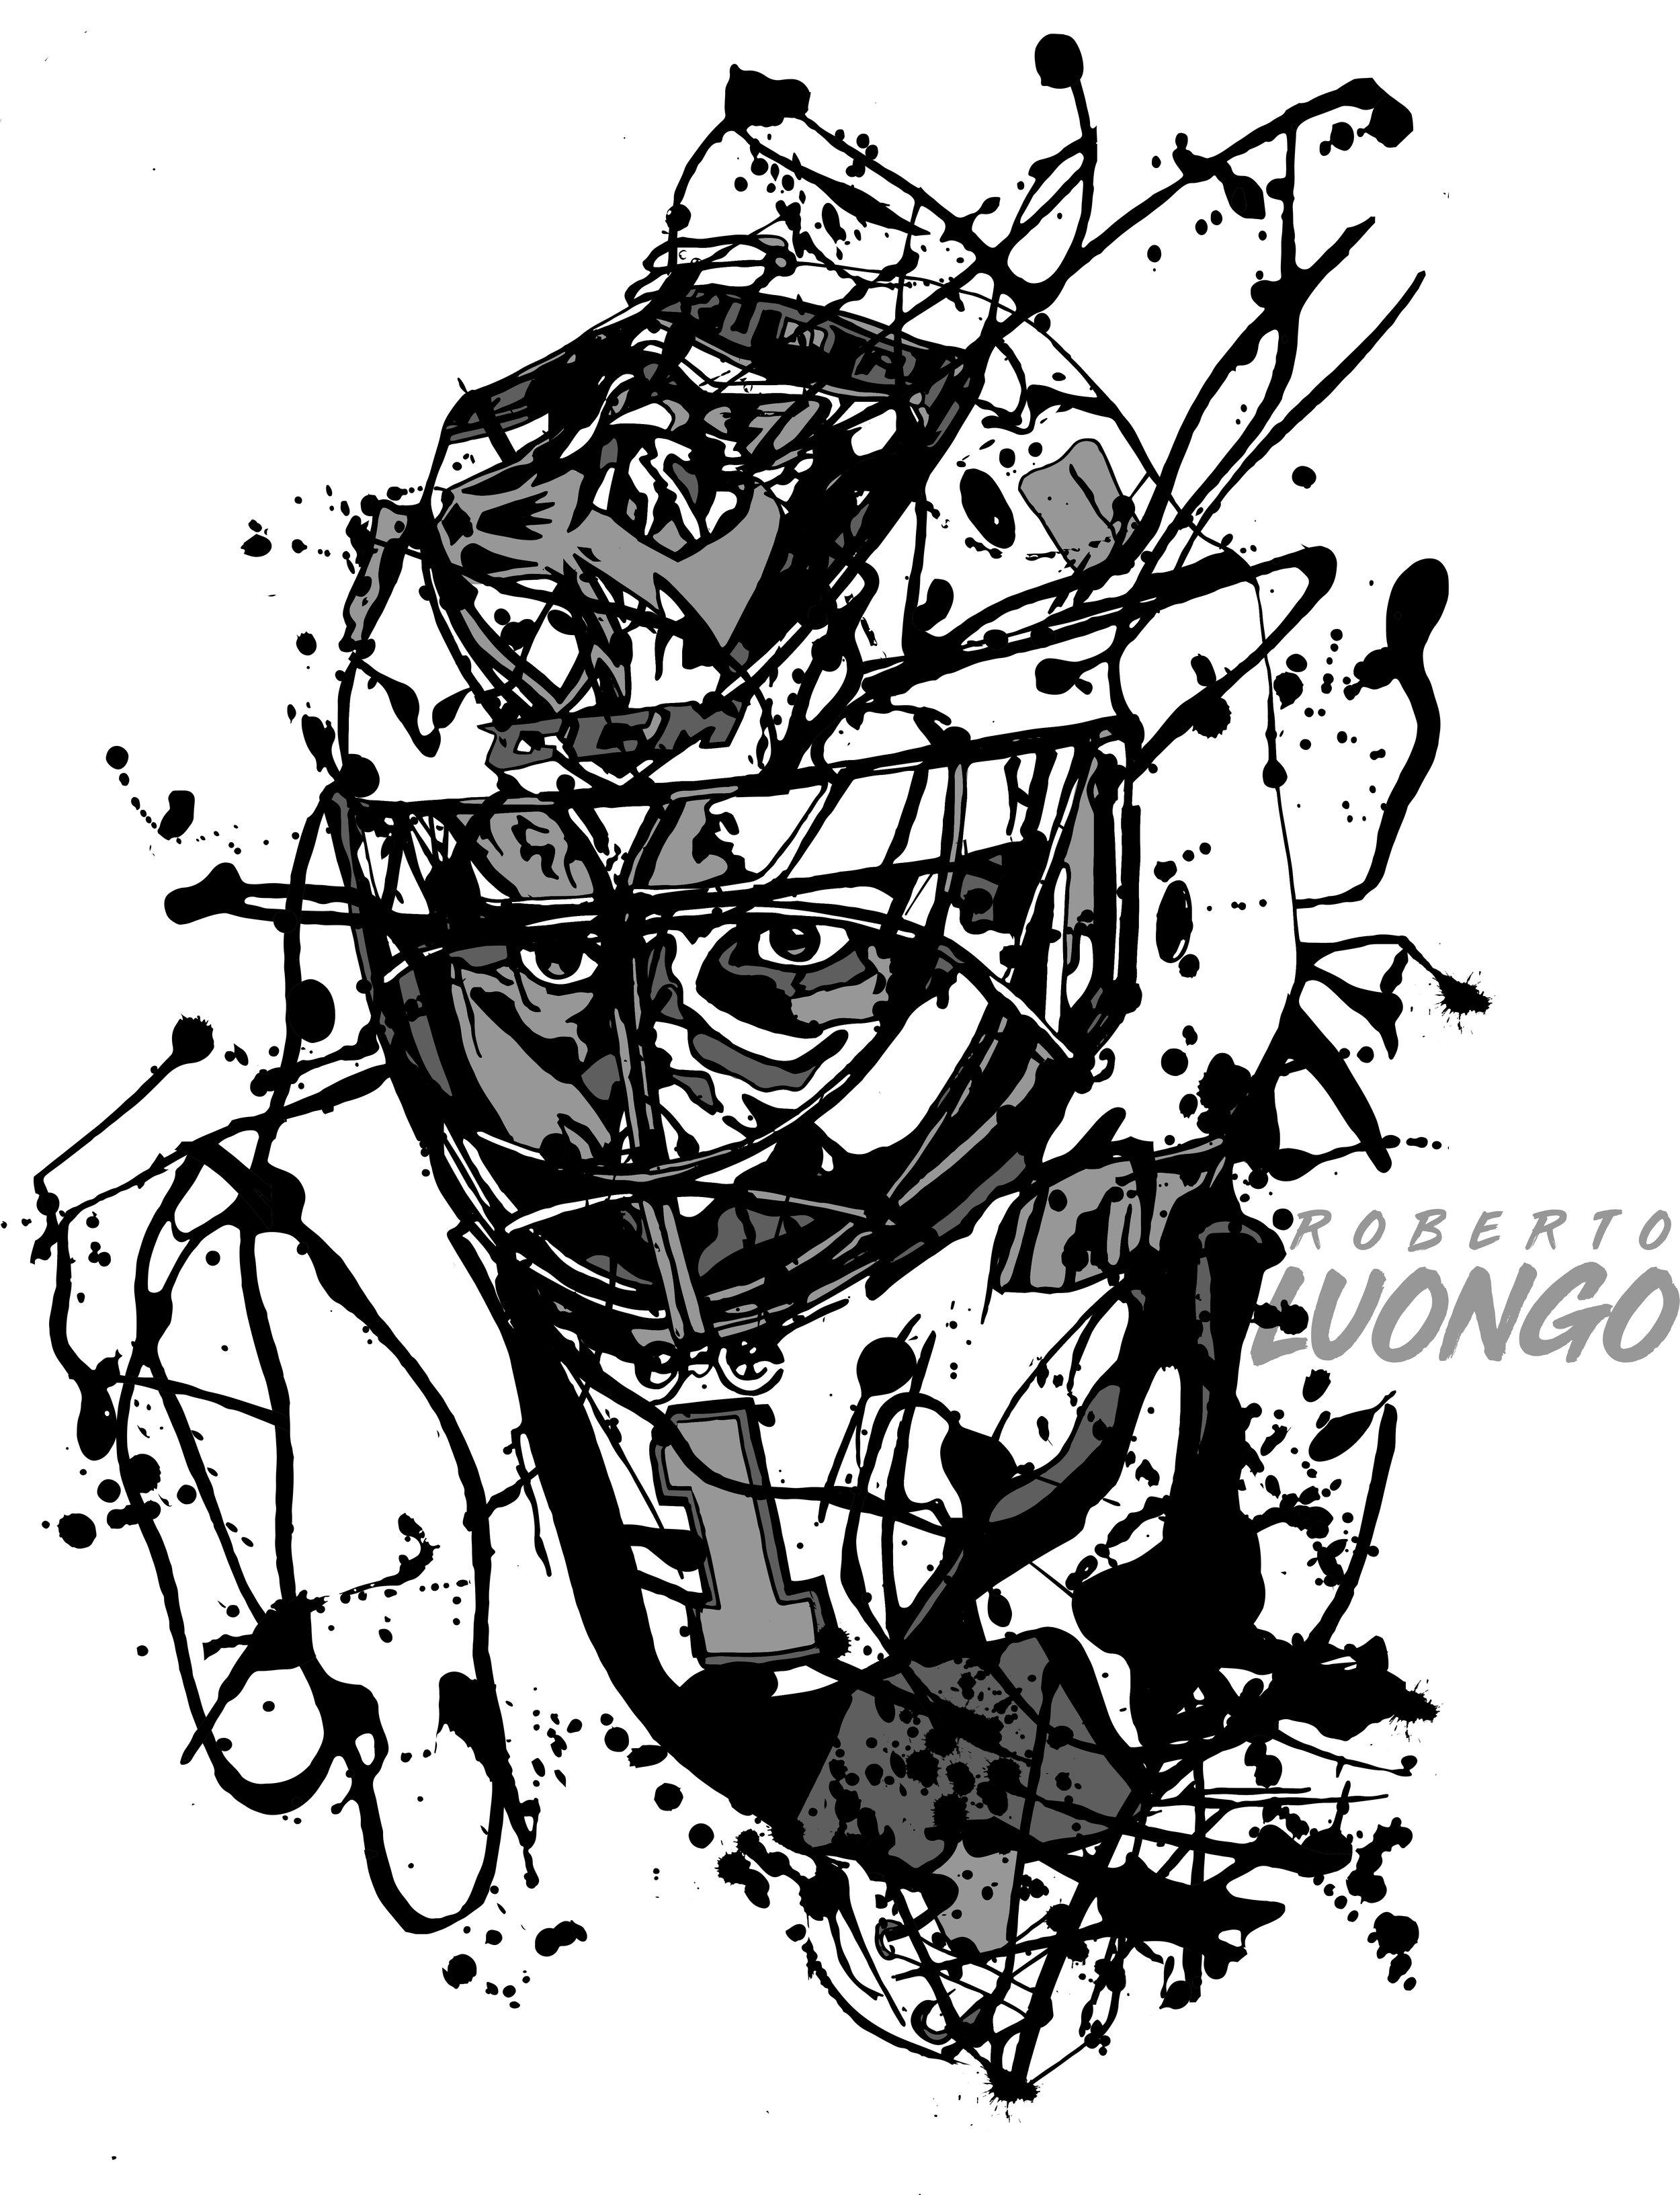 FLPA_Luongo_Legacy_Shirt_Concept_01_Print.jpg